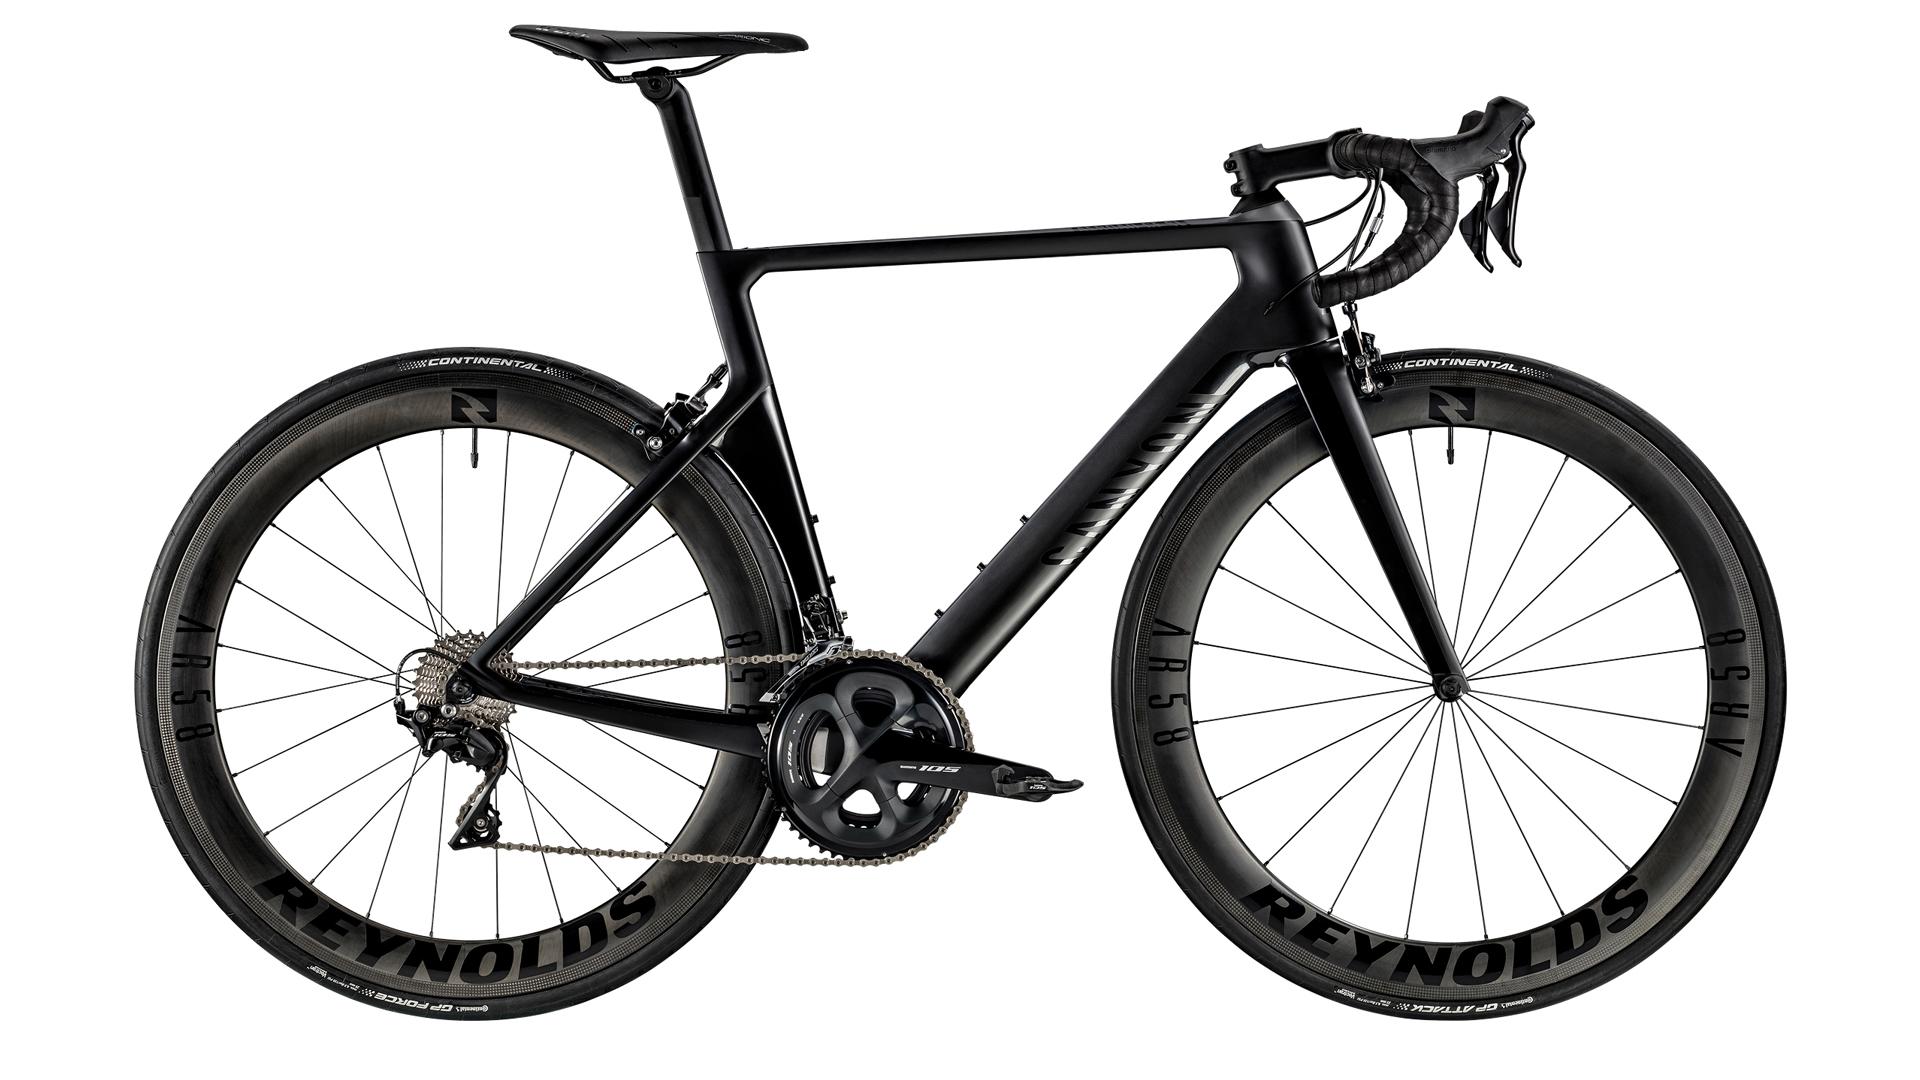 Best aero road bikes: Canyon Aeroad CF SL 7.0